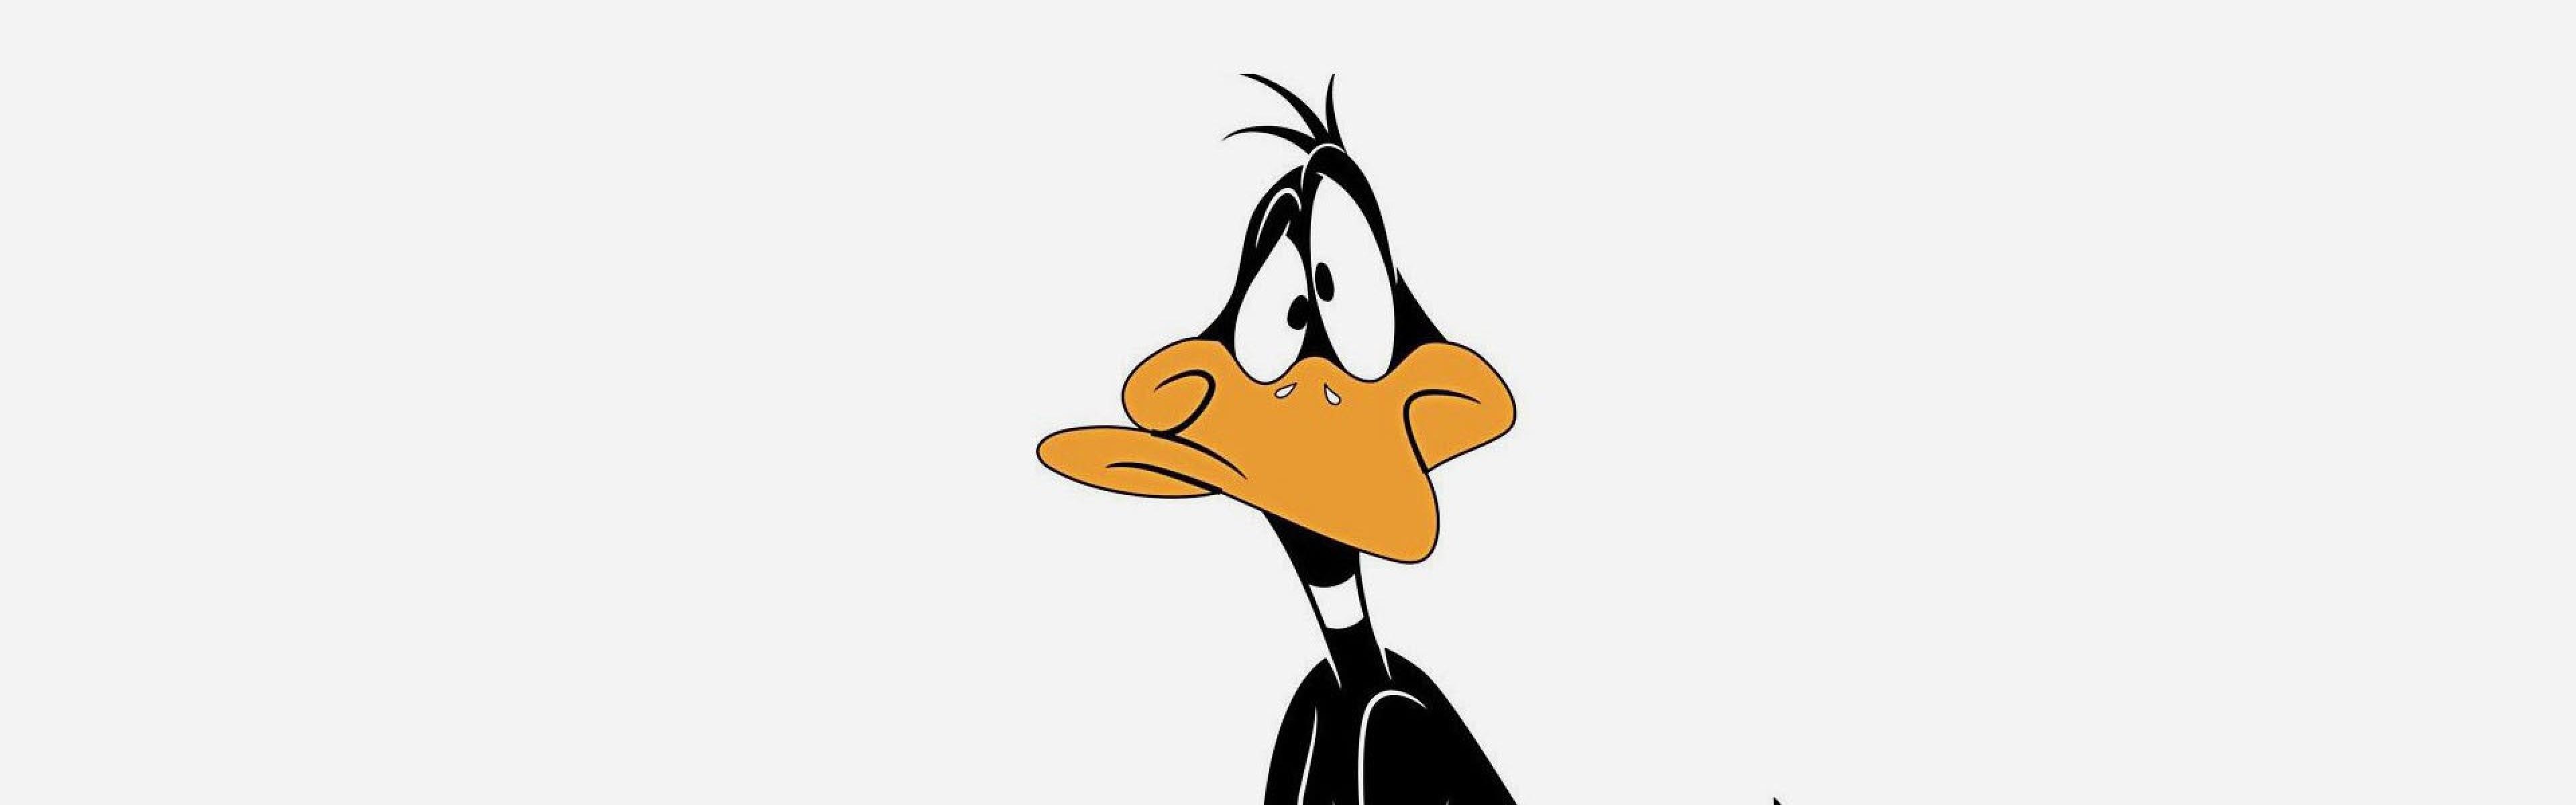 3840x1200 Wallpaper looney tunes, daffy duck, cartoon